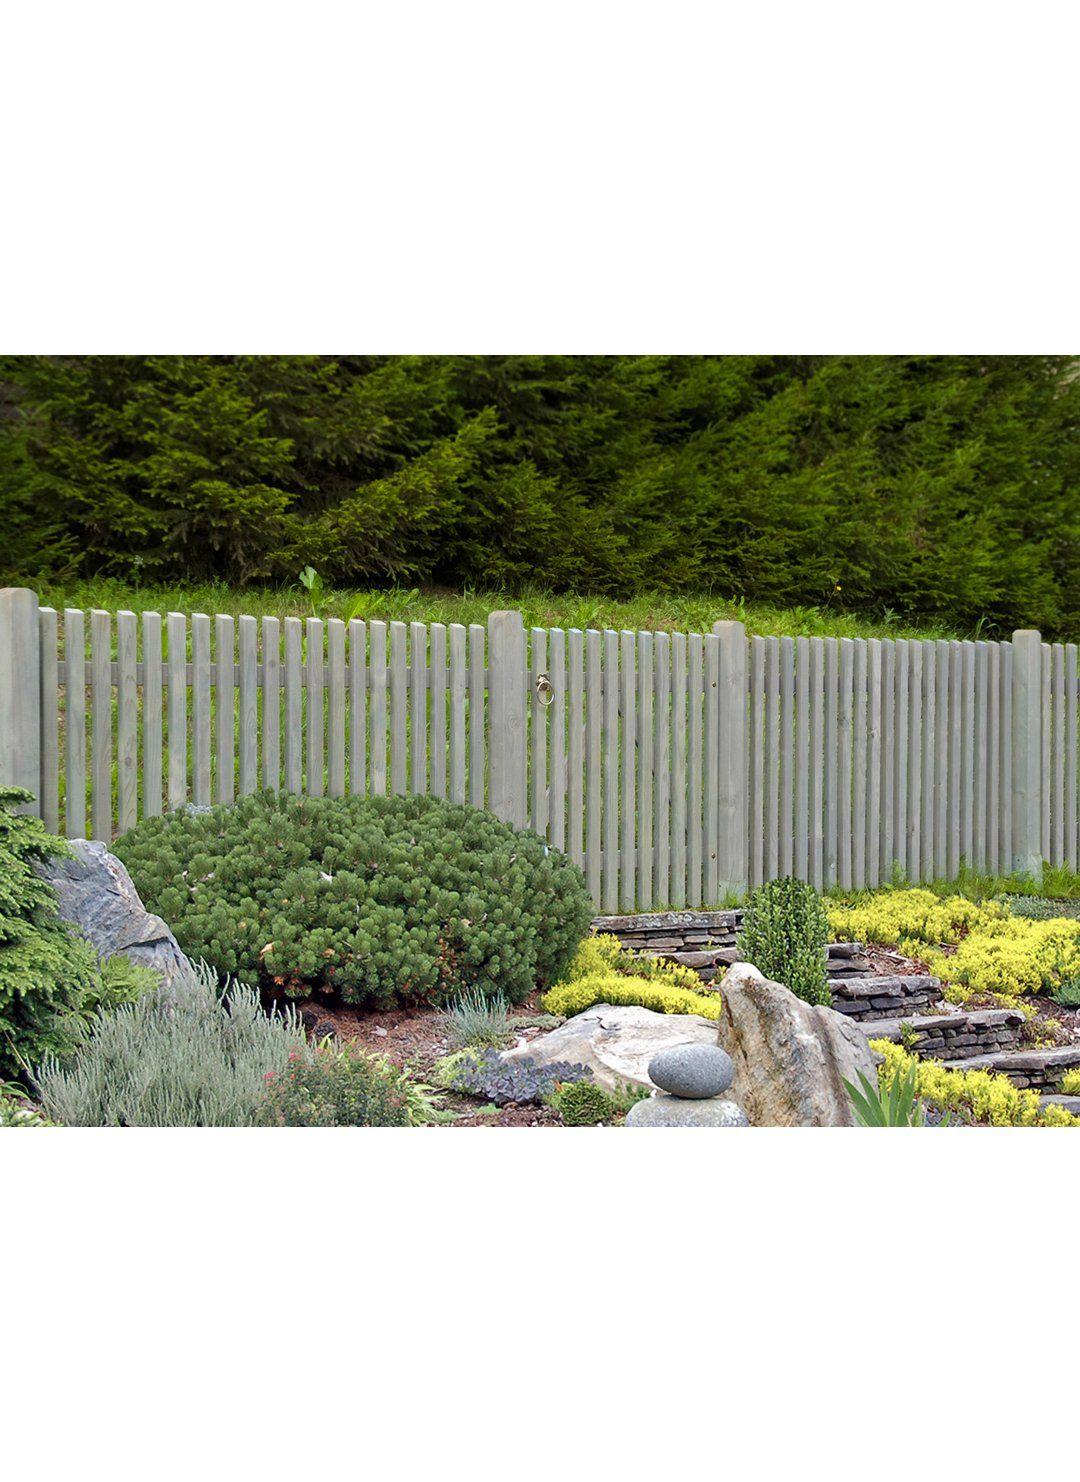 Staketenzaun Mainau Hellgrau Lasiert 180 Cm X 100 Cm Kaufen Bei Obi Zaun Garten Gartenzaun